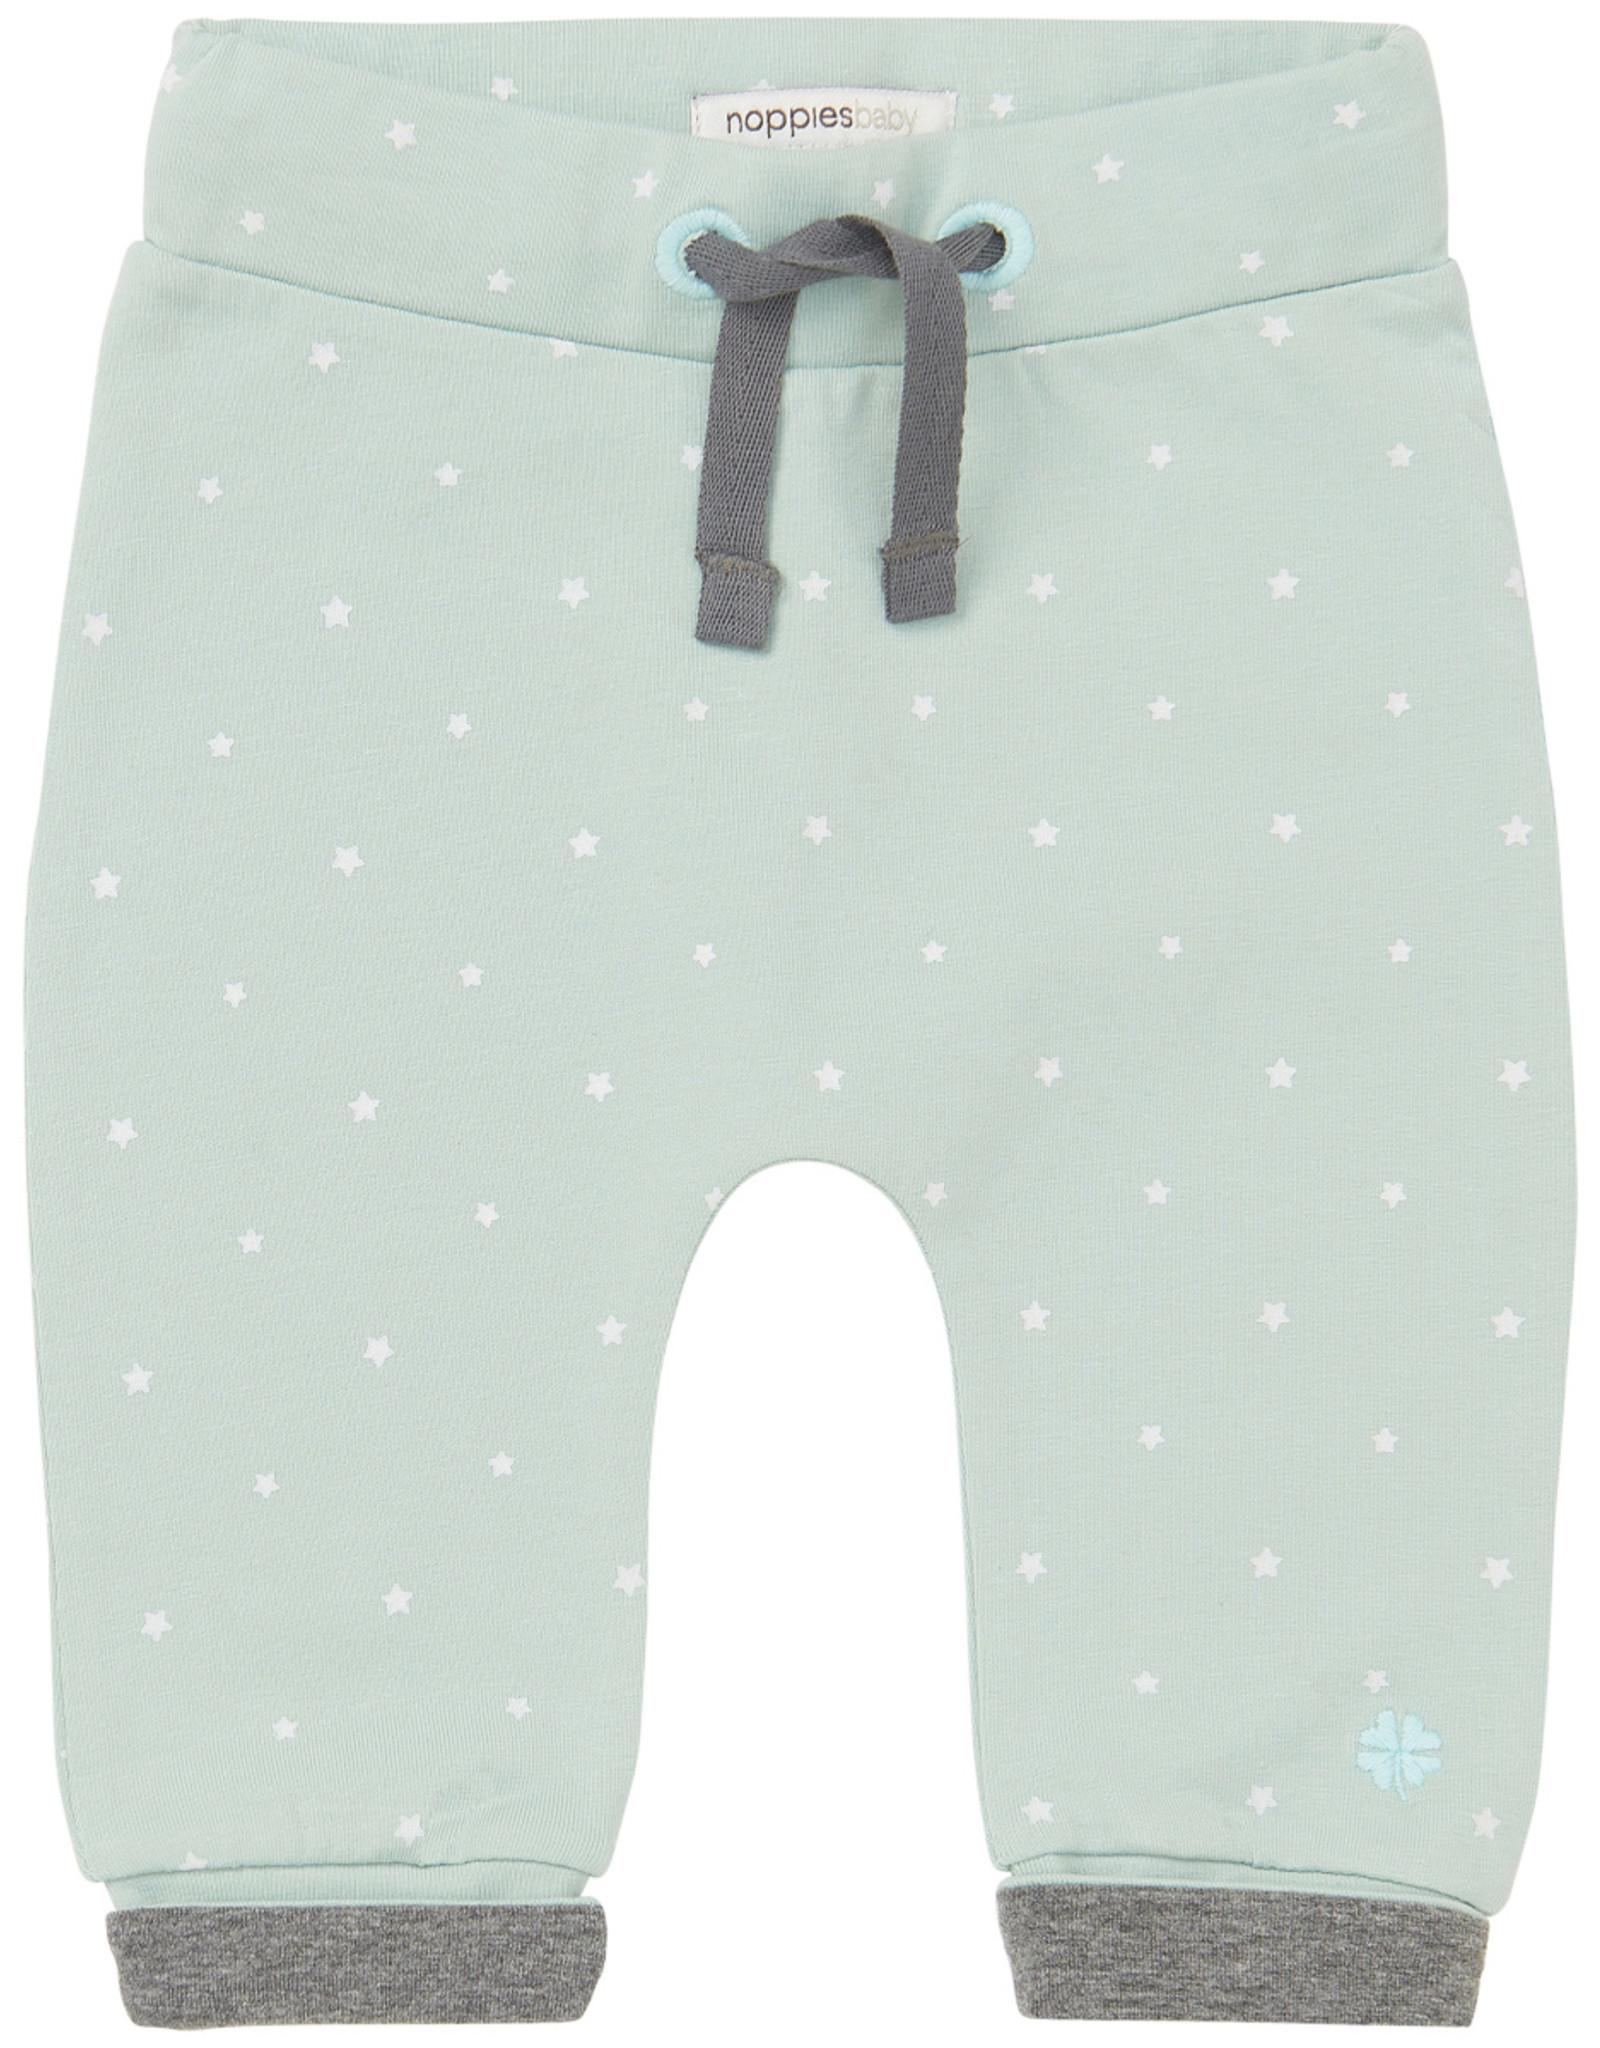 Noppies U Pants jrsy comfort Bo grey mint